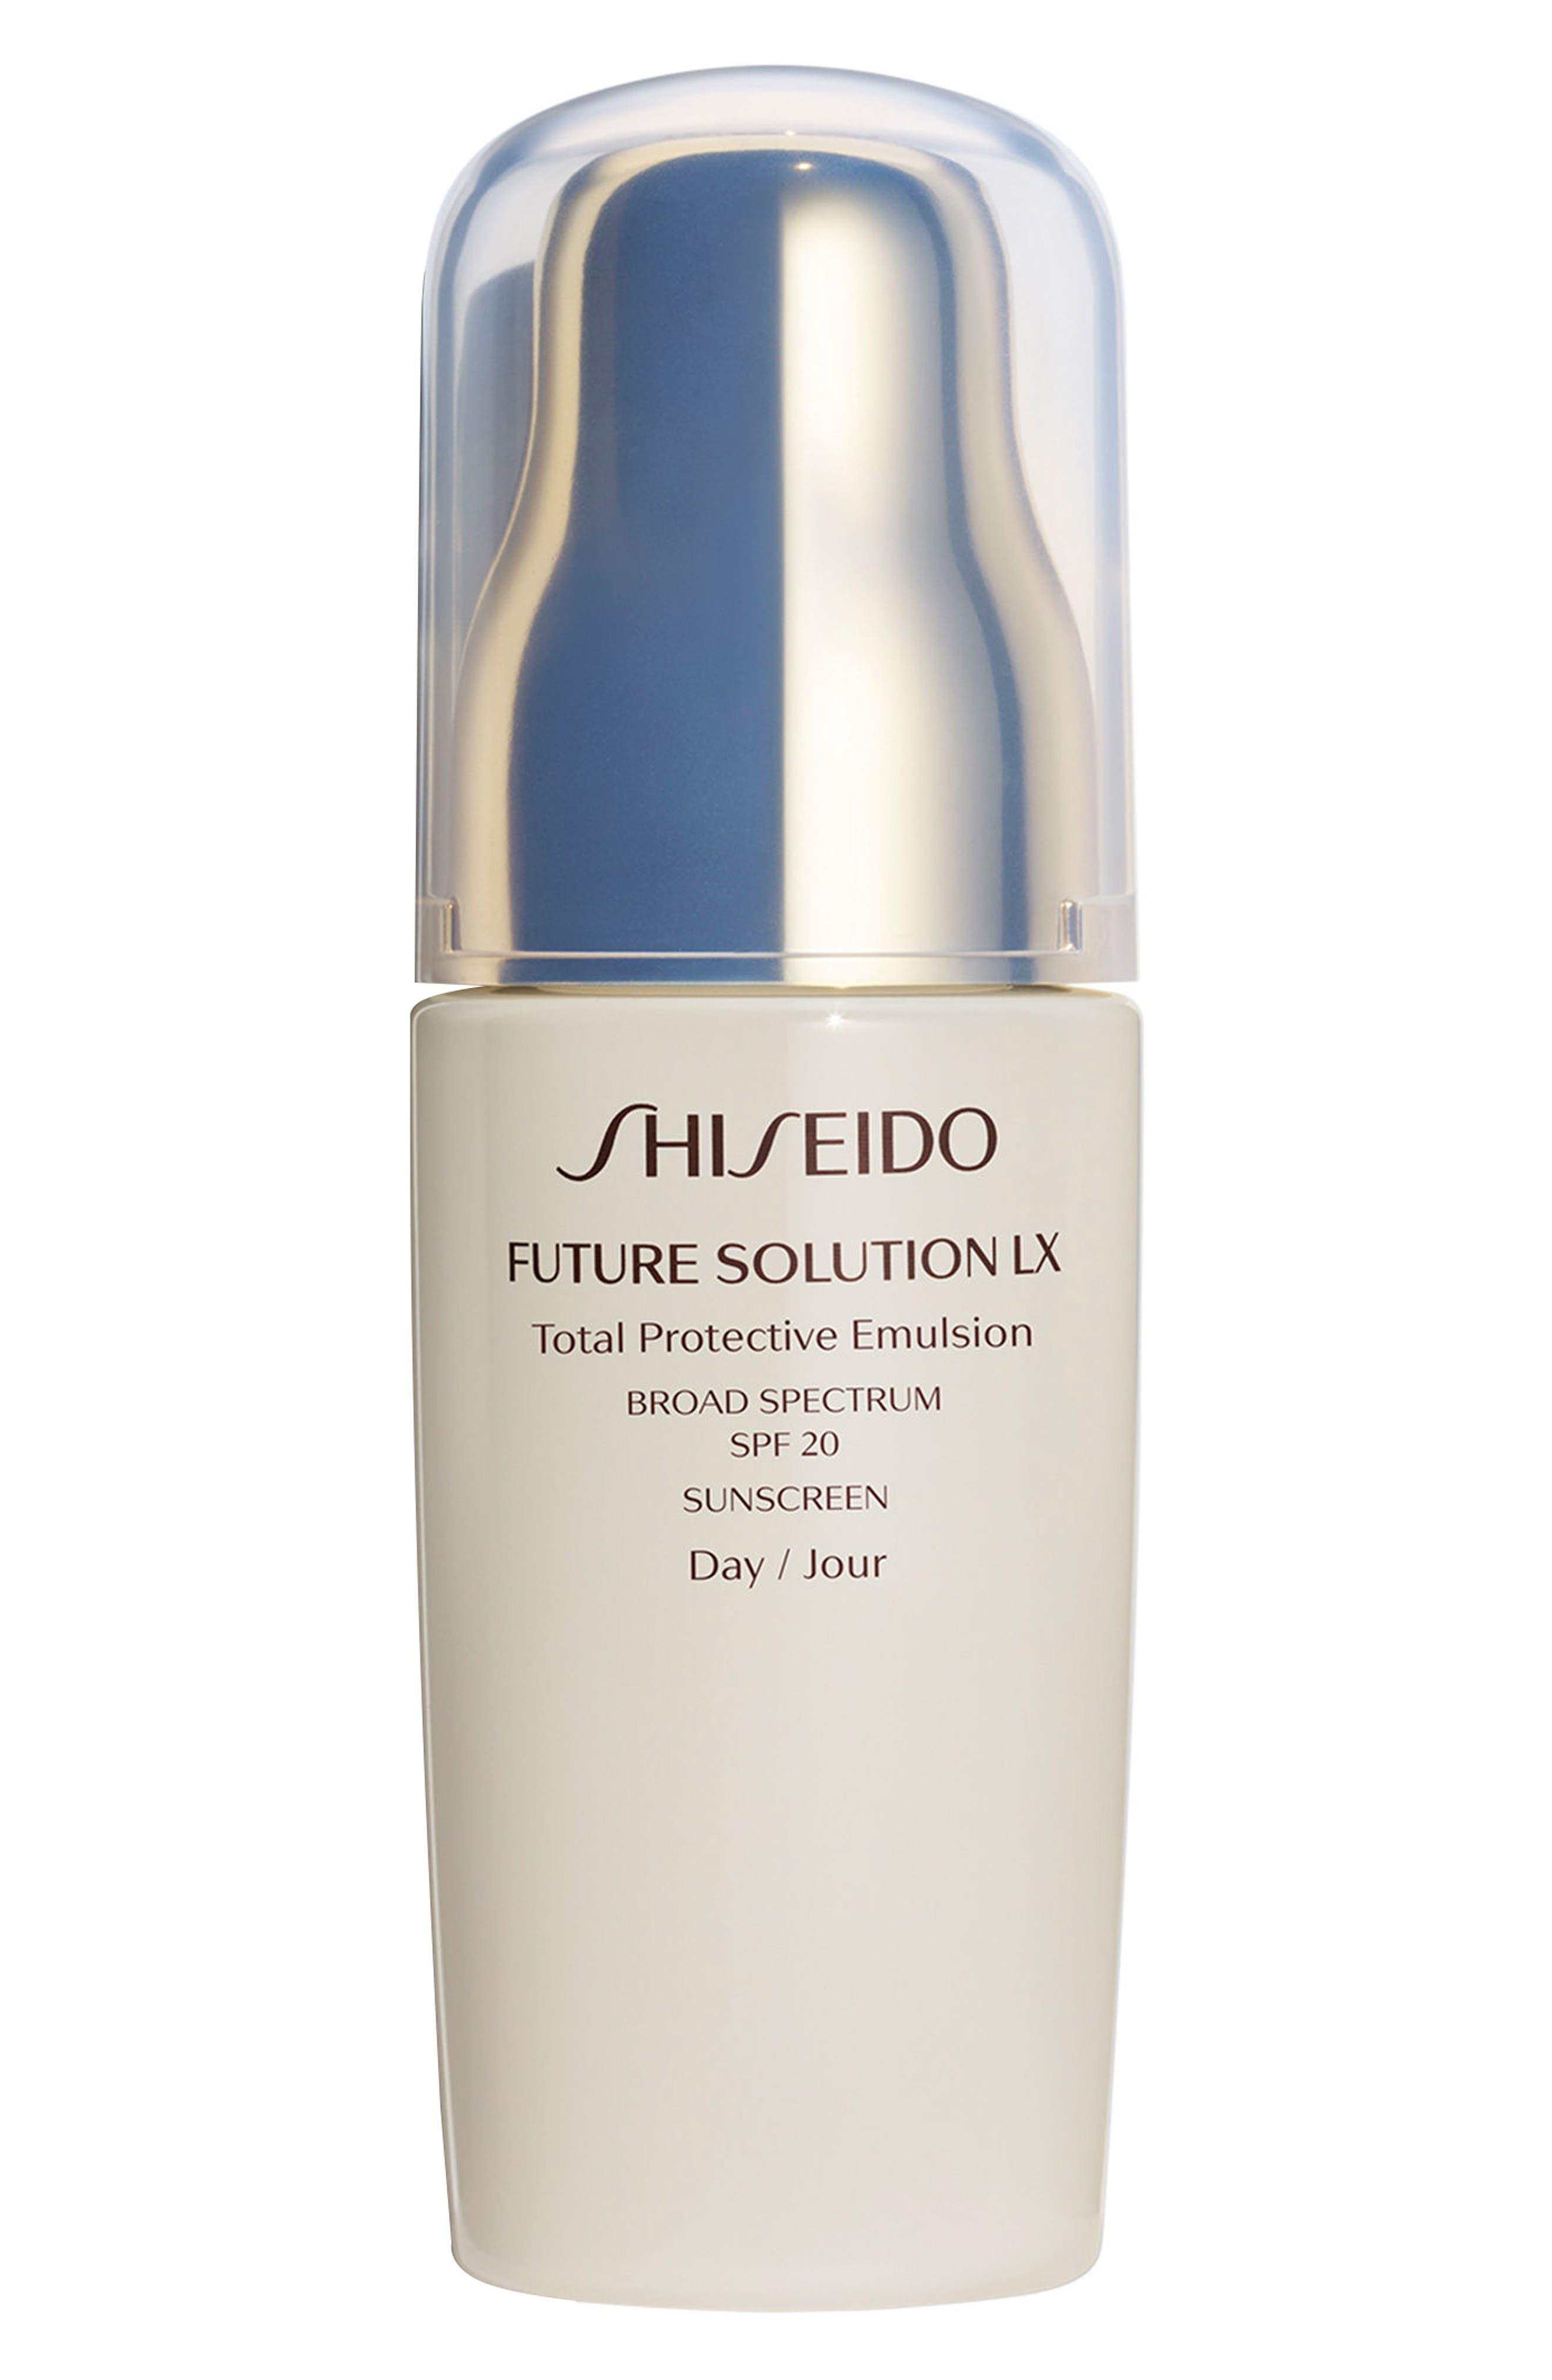 Main Image - Shiseido Future Solution LX Total Protective Emulsion Broad Spectrum SPF 20 Sunscreen